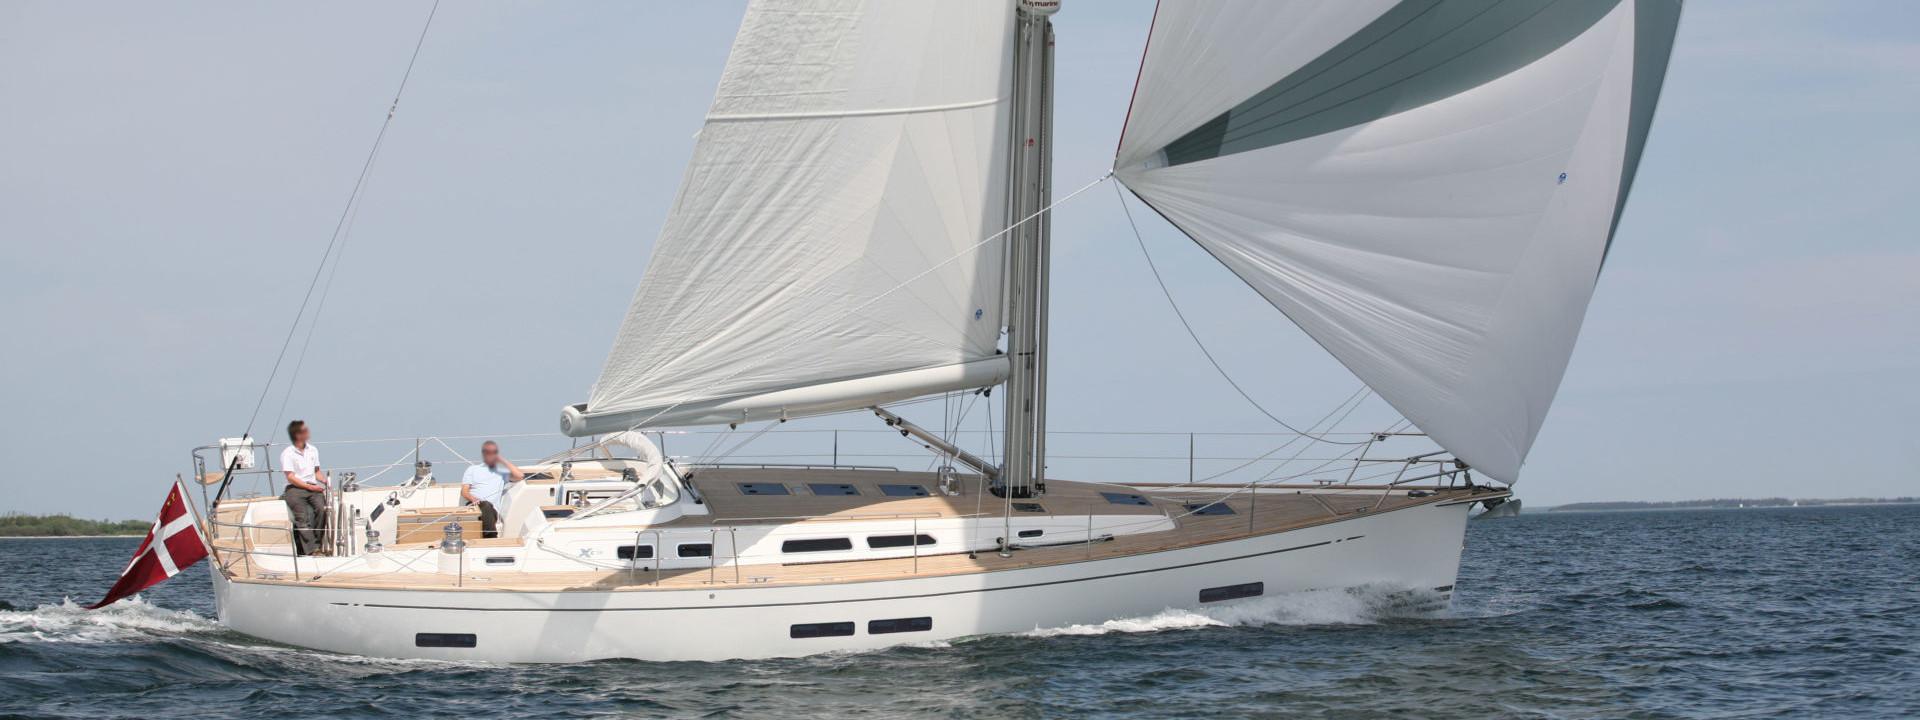 X Yachts - Xc50